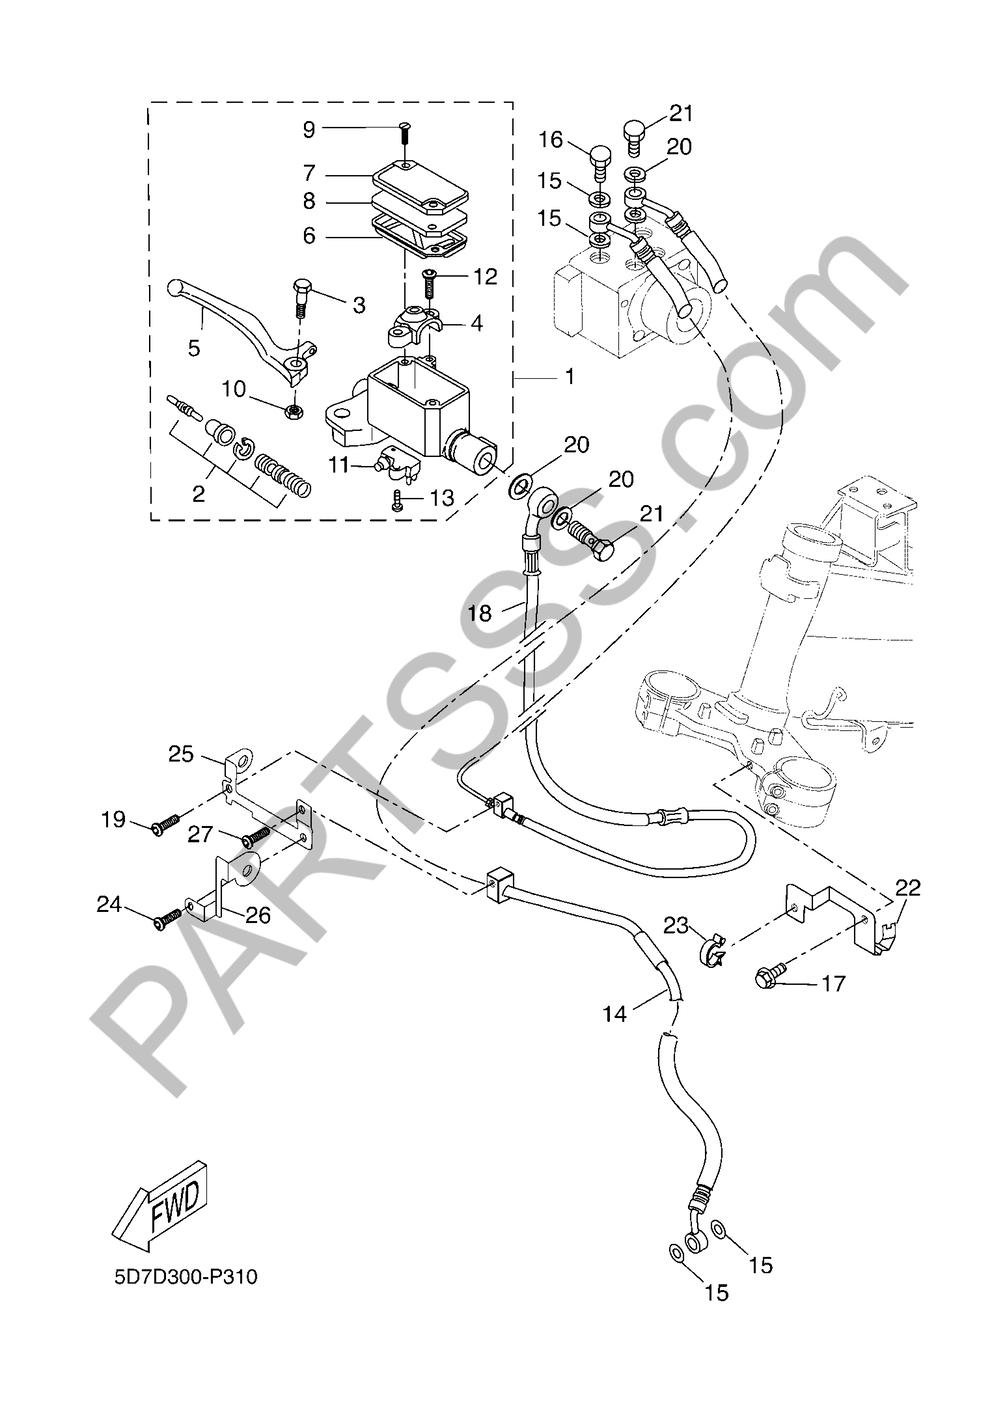 CILINDRO MAESTRO DELANTERO Yamaha MT-125 ABS 2018